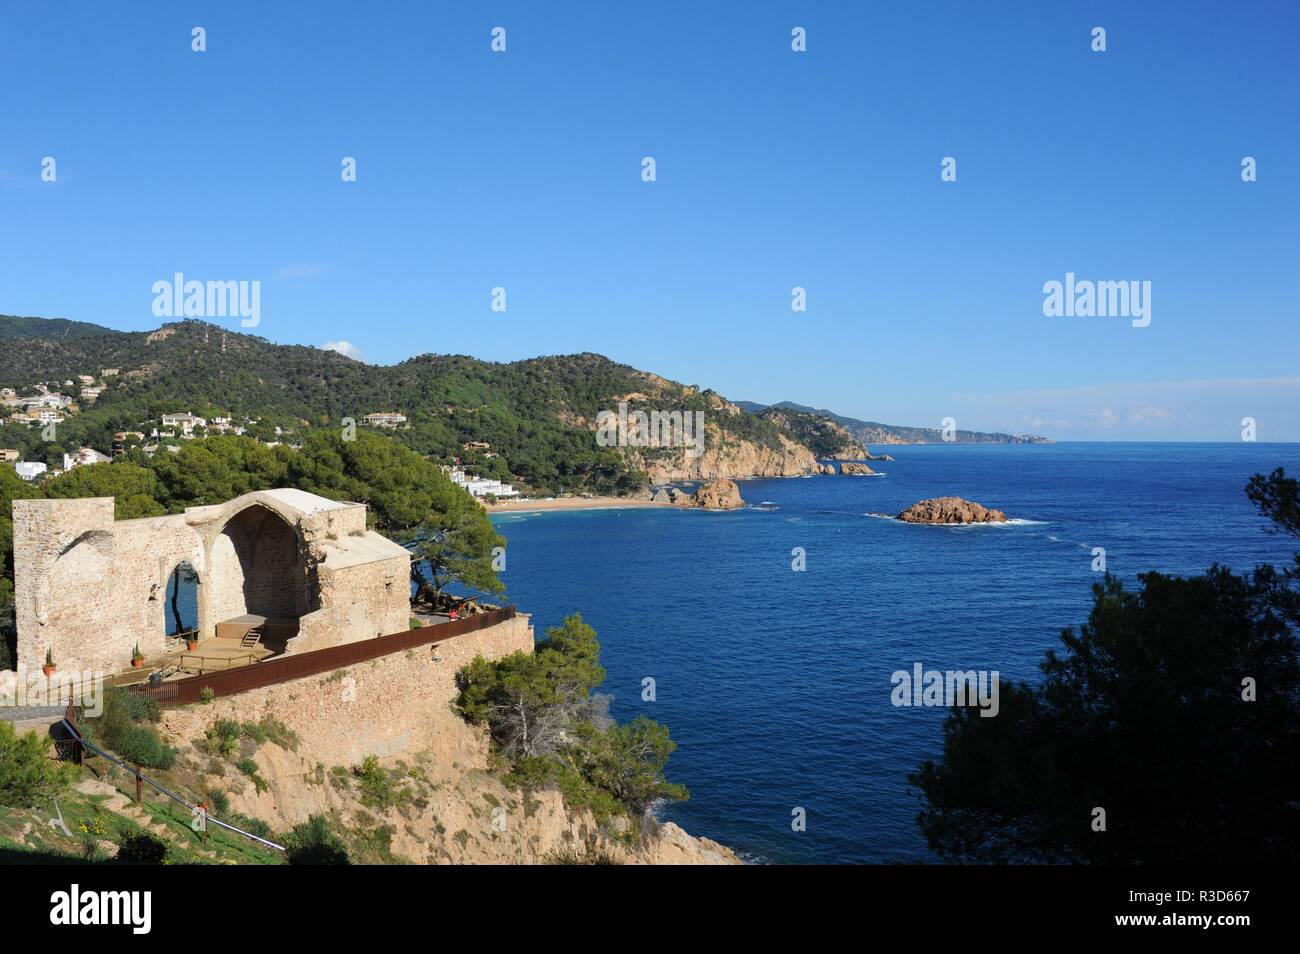 tossa de mar,costa brava,spain castle - fassaden - Stock Image